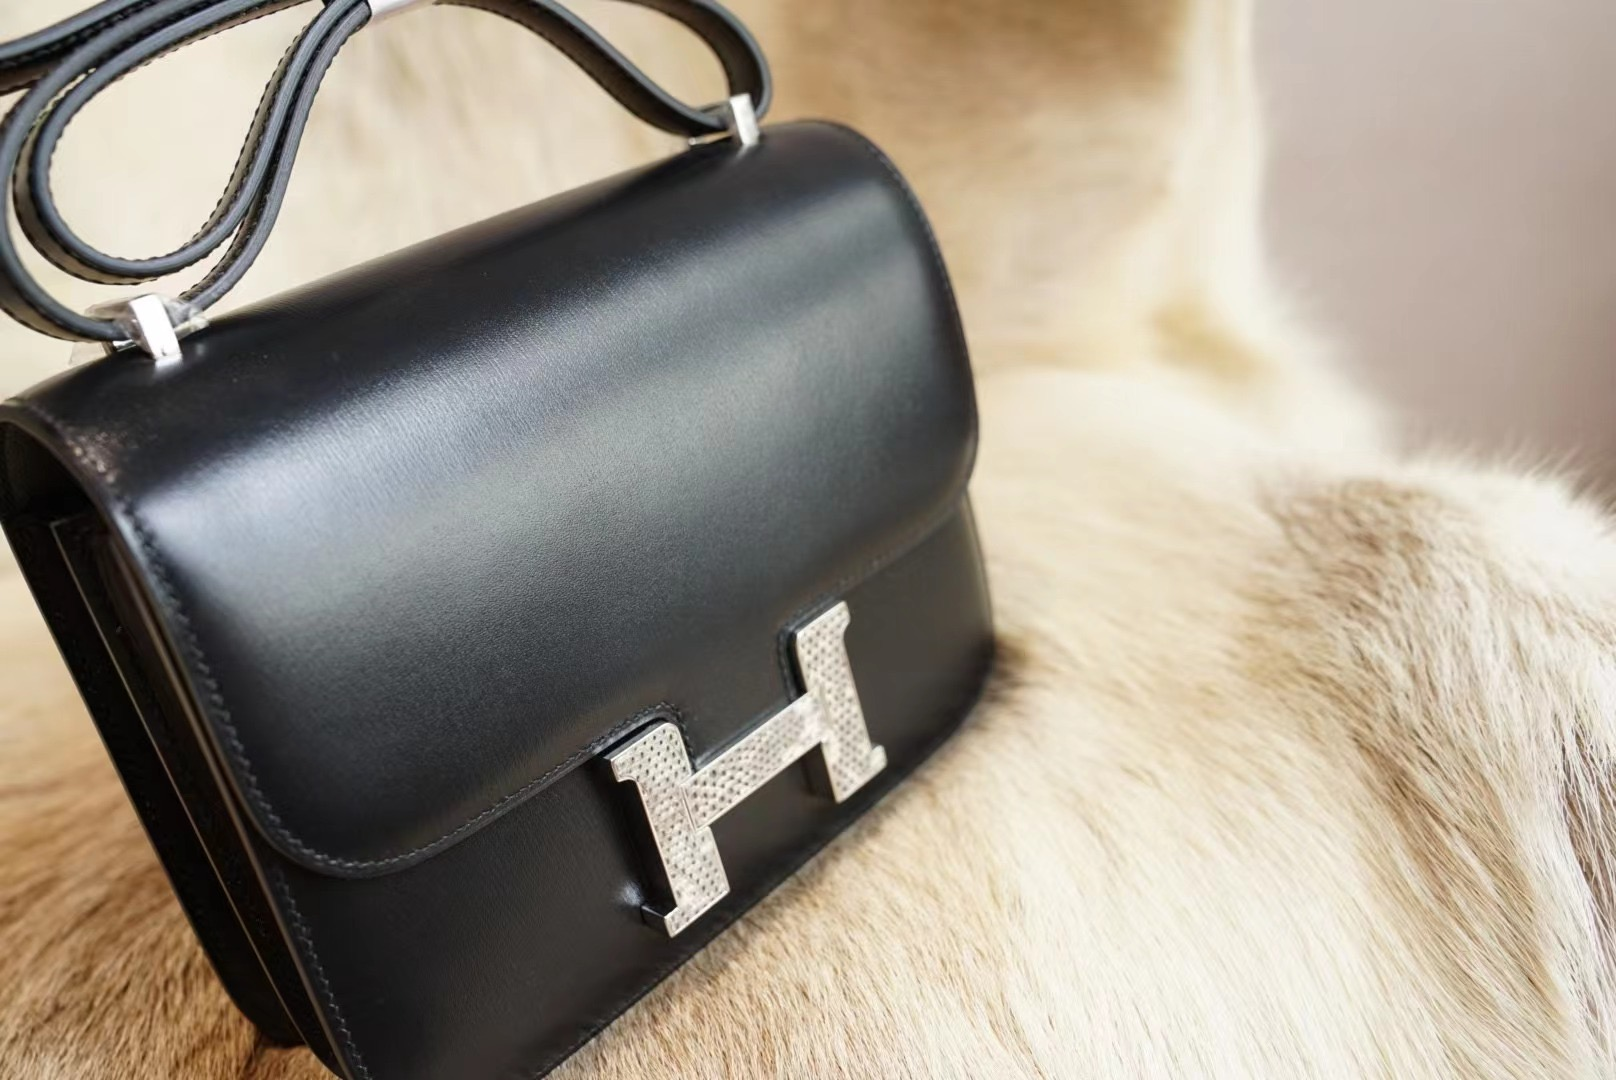 Hermes Constance CK89黑色 拼雪花蜥蜴扣 小康19 原厂Box皮 法国蜡线 全手缝